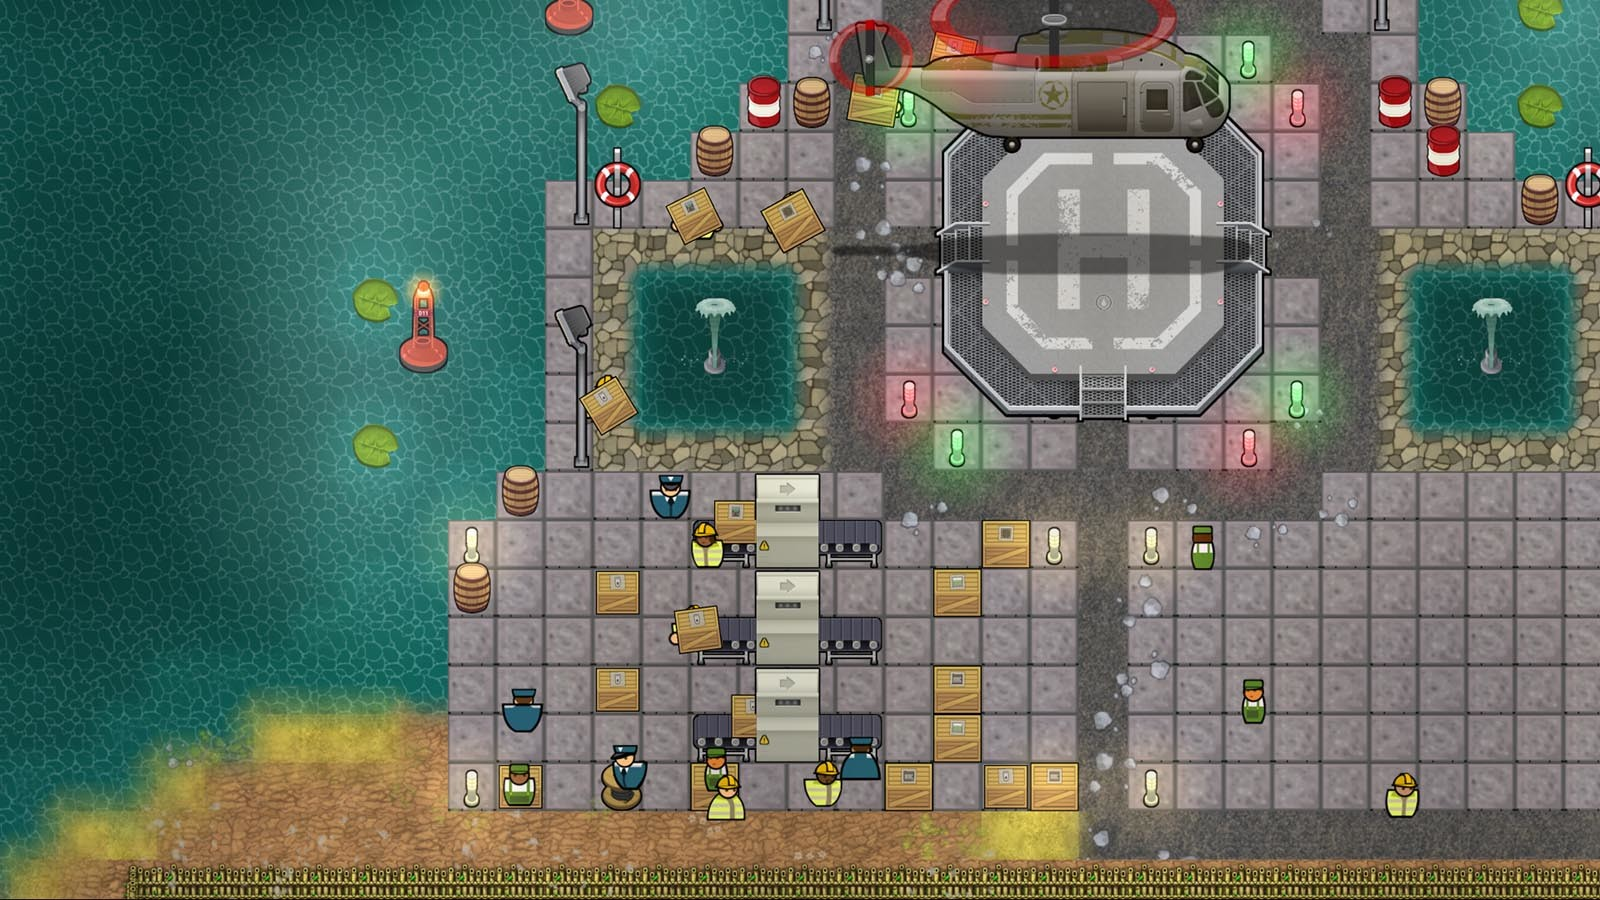 Prison Architect - Island Bound | CN_KR_LATAM_TR (790754e4-8965-4d05-9bba-00dbc1441183)